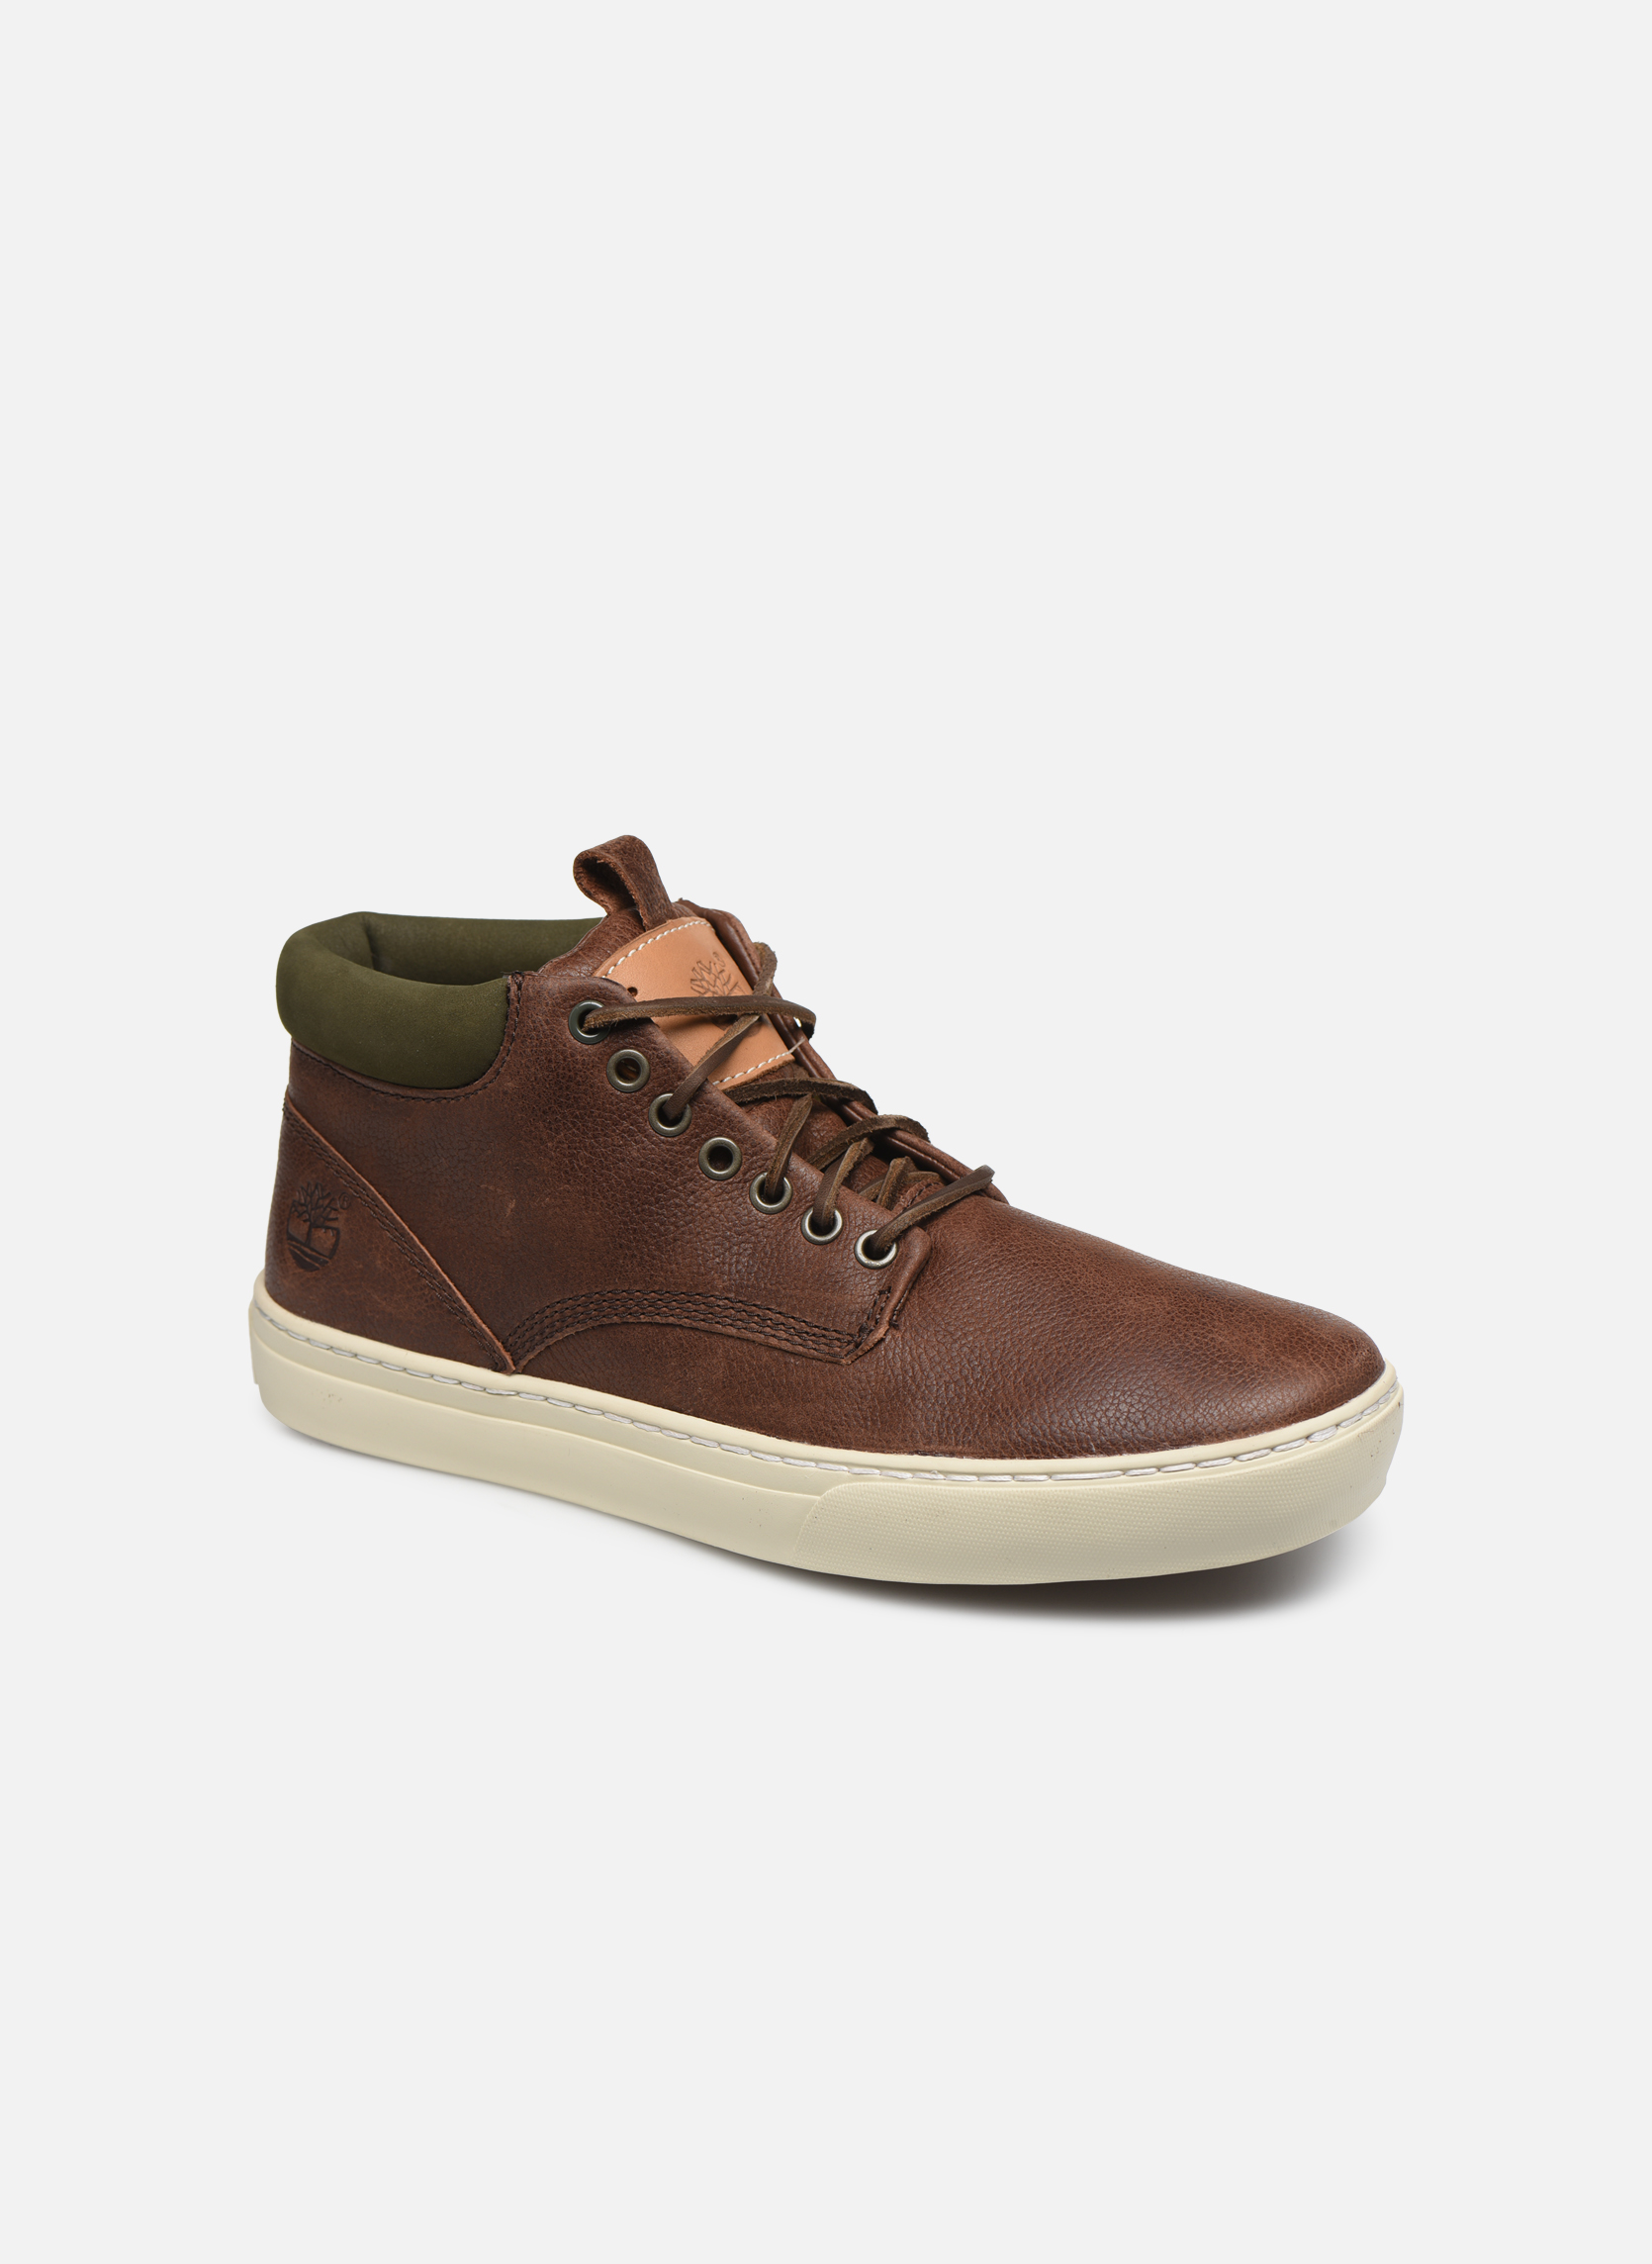 Sneaker Herren Earthkeepers 2.0 Cupsole Chukka